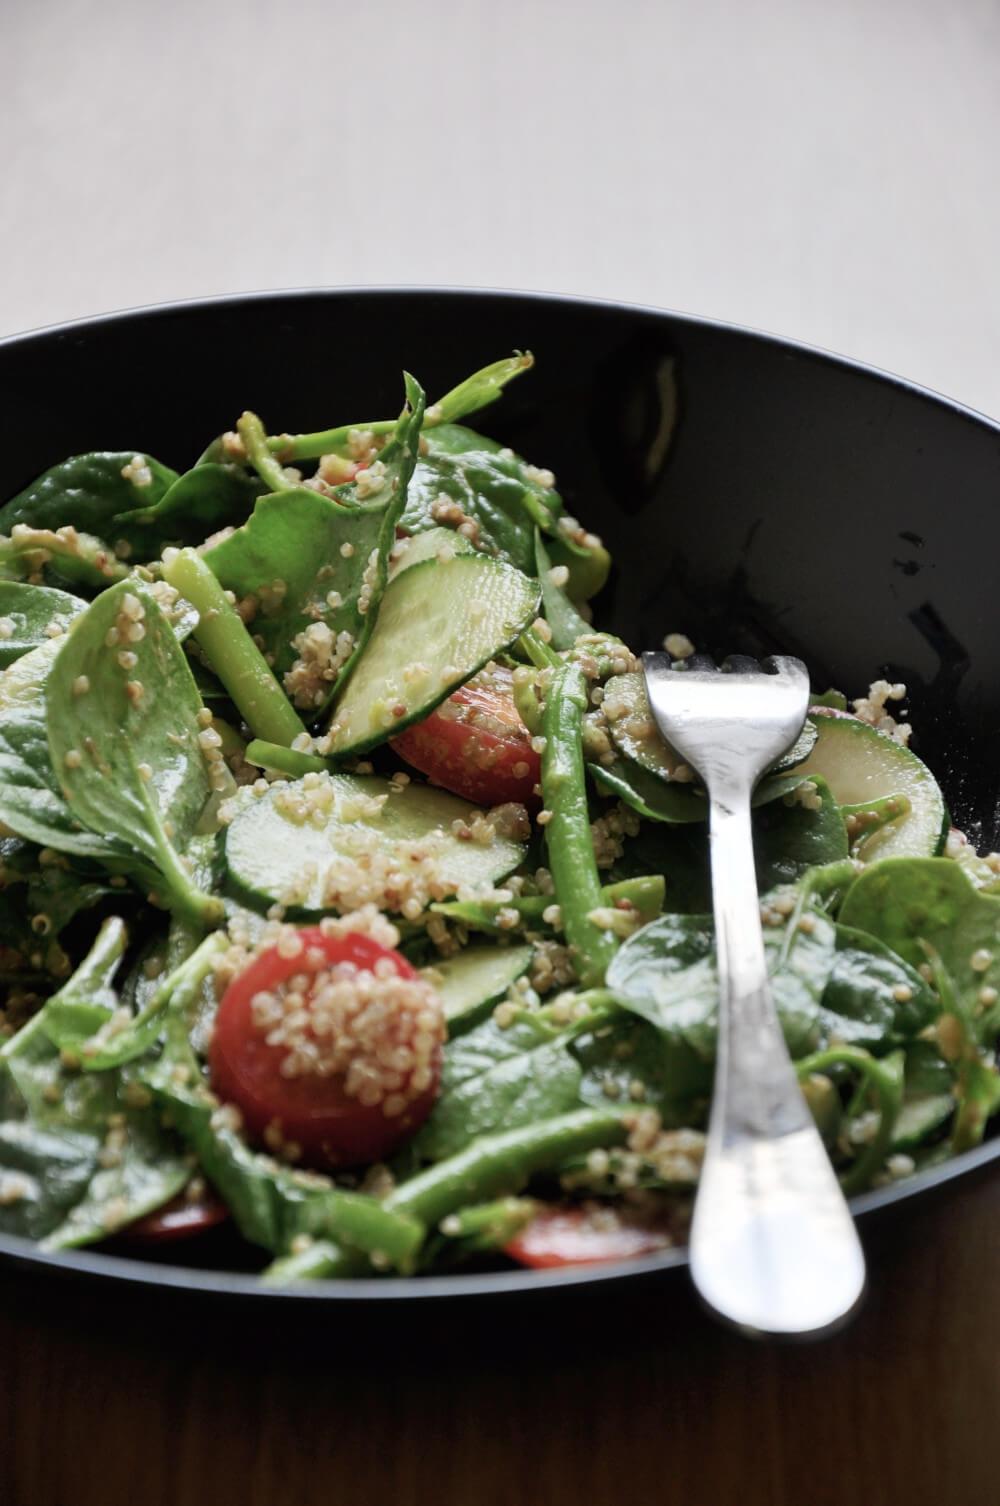 Quinoa Edamame Salad with Sesame Dressing